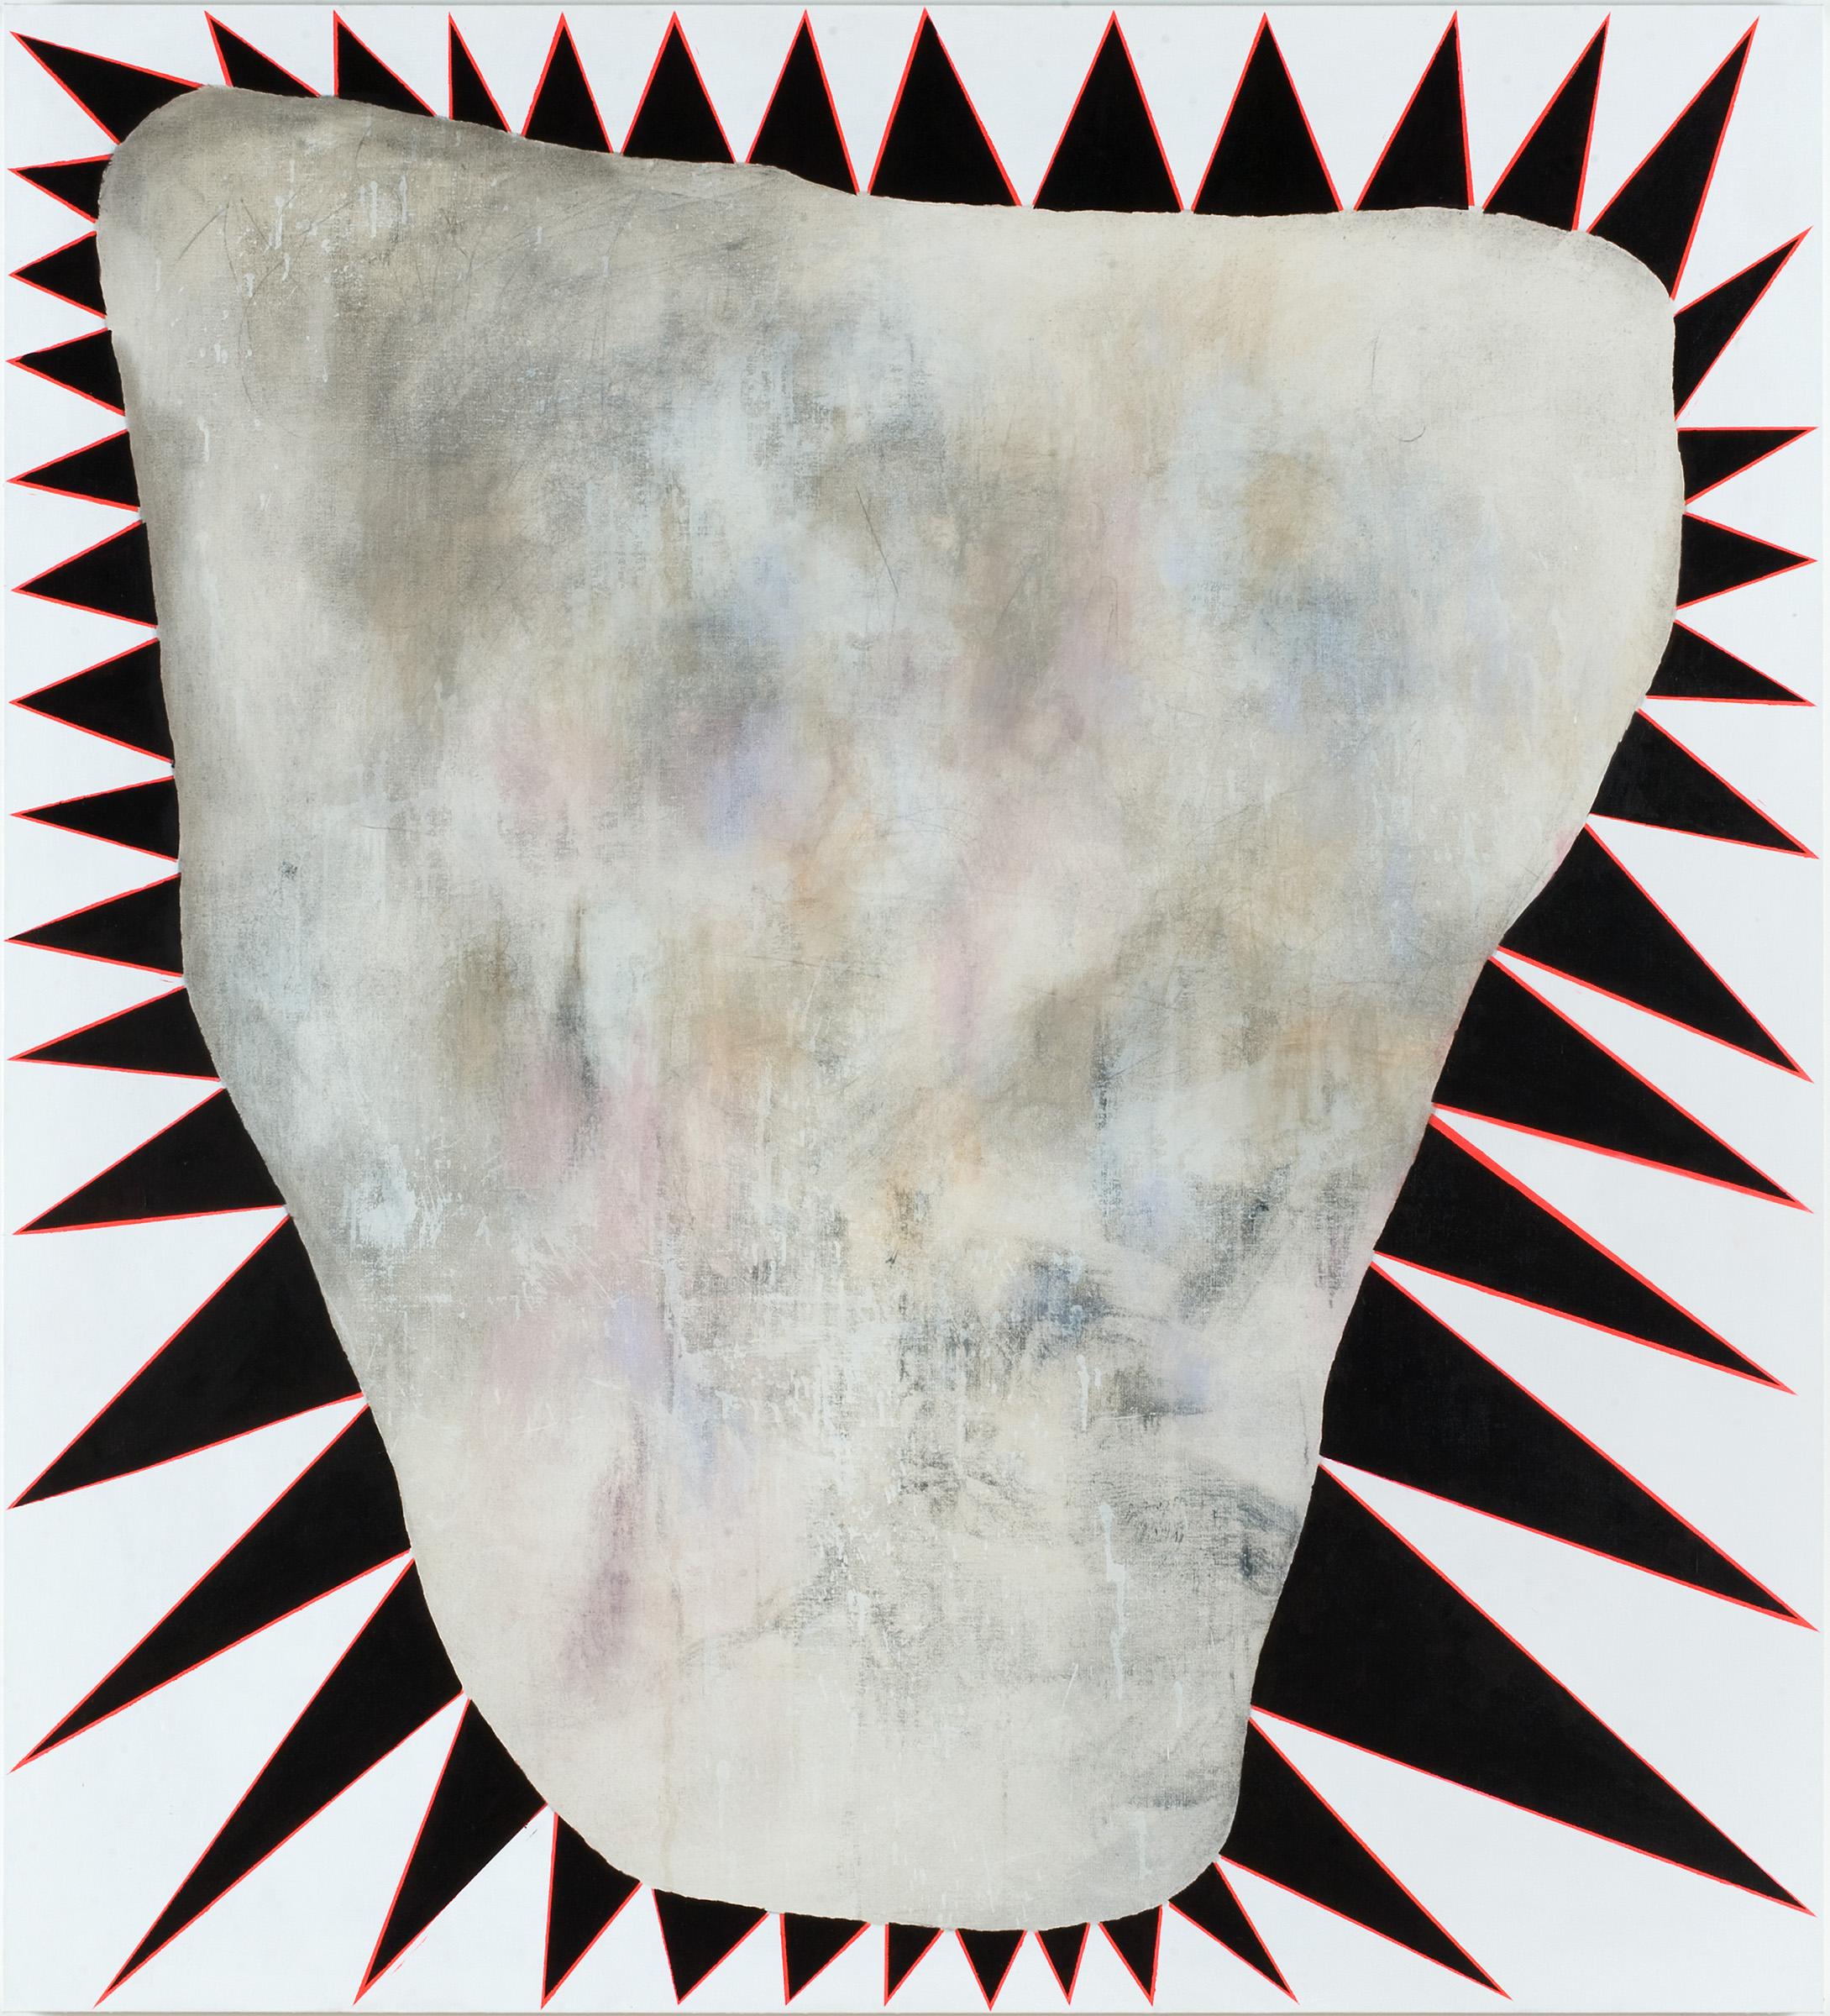 Charline von Heyl, P., 2008. Acrylic and crayons on linen, 208.3 x 188 x 3.8 cm. ©Charline von Heyl. Courtesy of the artist and Petzel, New York. Solomon R. Guggenheim Museum, New York Gift, Adam and LeeLee Kimmel, 2016